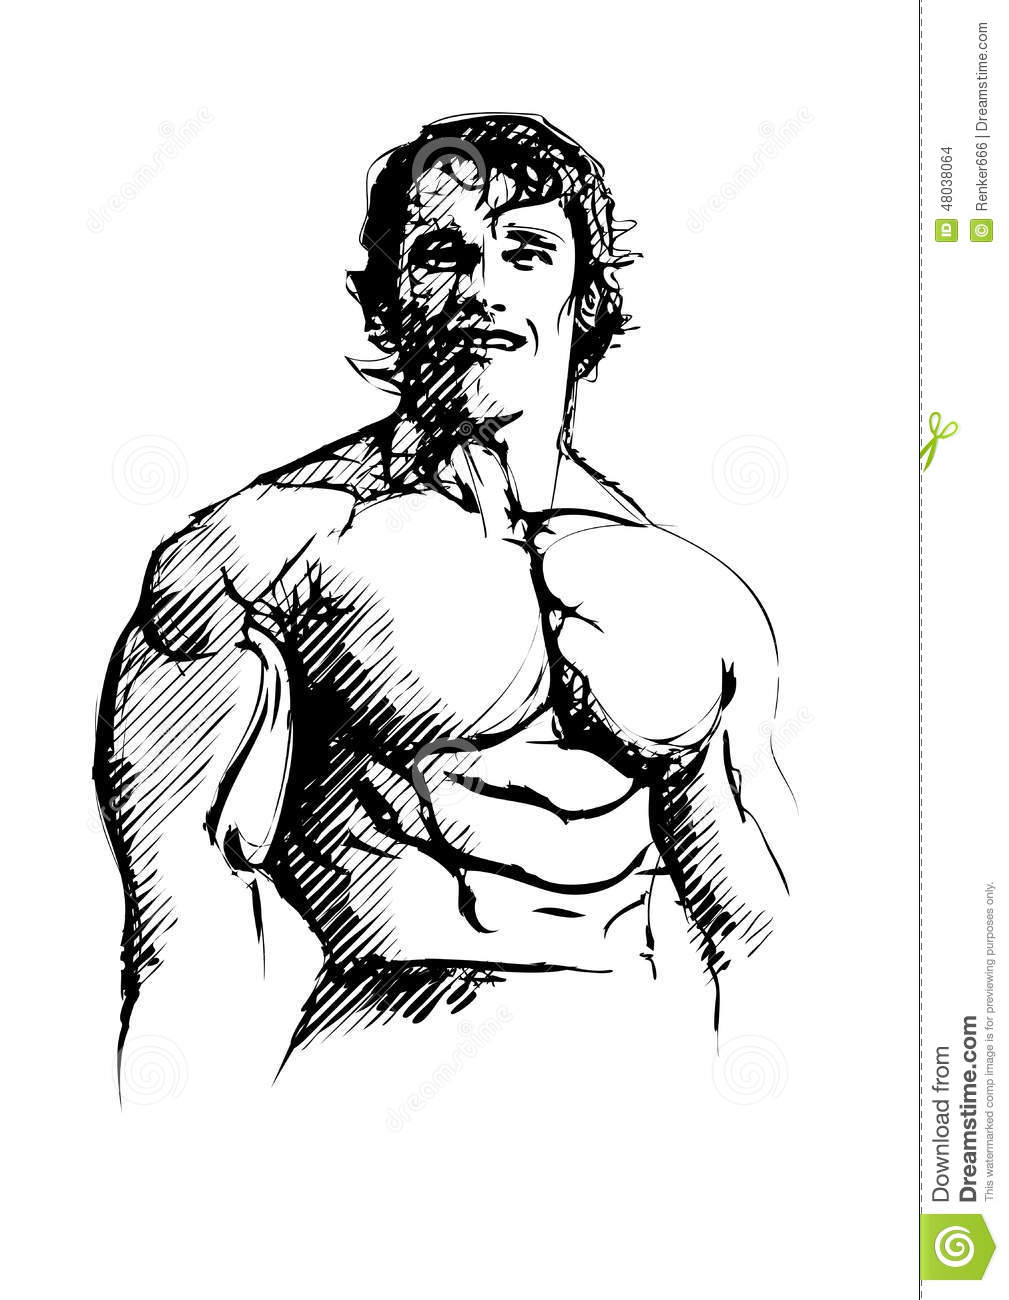 Arnold Schwarzenegger Stock Illustration-Arnold Schwarzenegger Stock Illustrations u2013 5 Arnold Schwarzenegger Stock  Illustrations, Vectors u0026 Clipart - Dreamstime-9